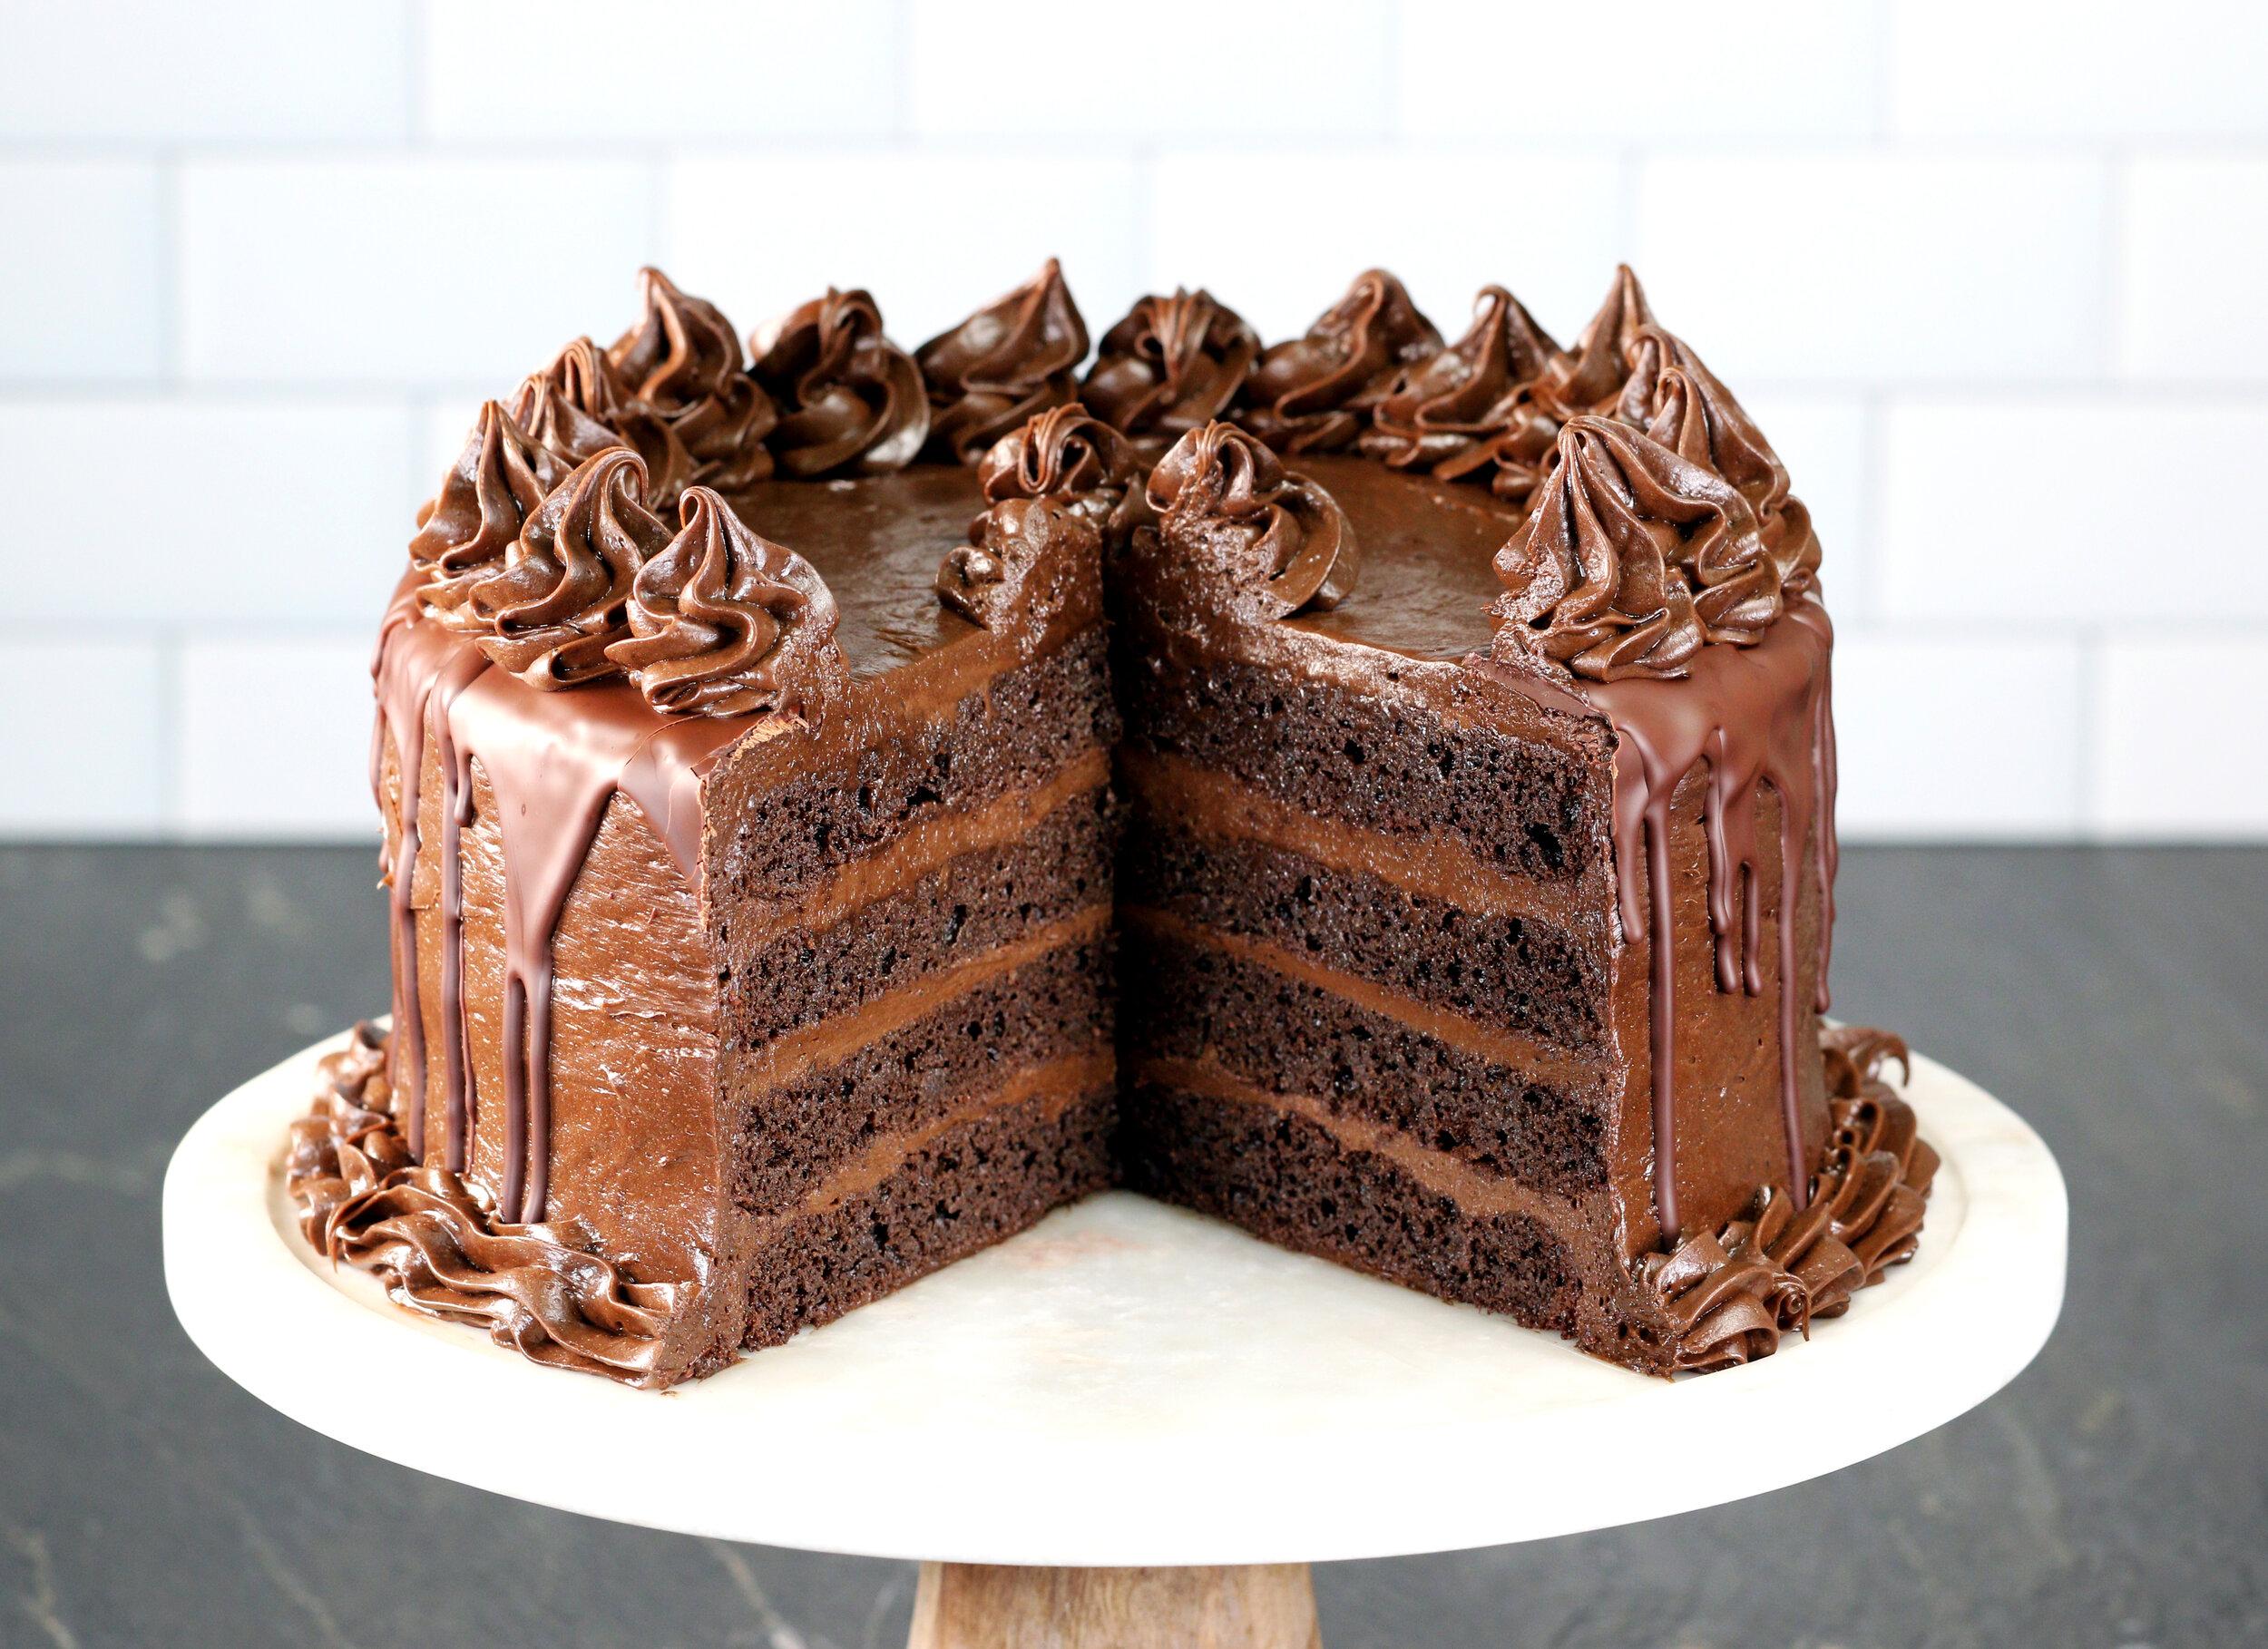 KETO BIRTHDAY CHOCOLATE CAKE